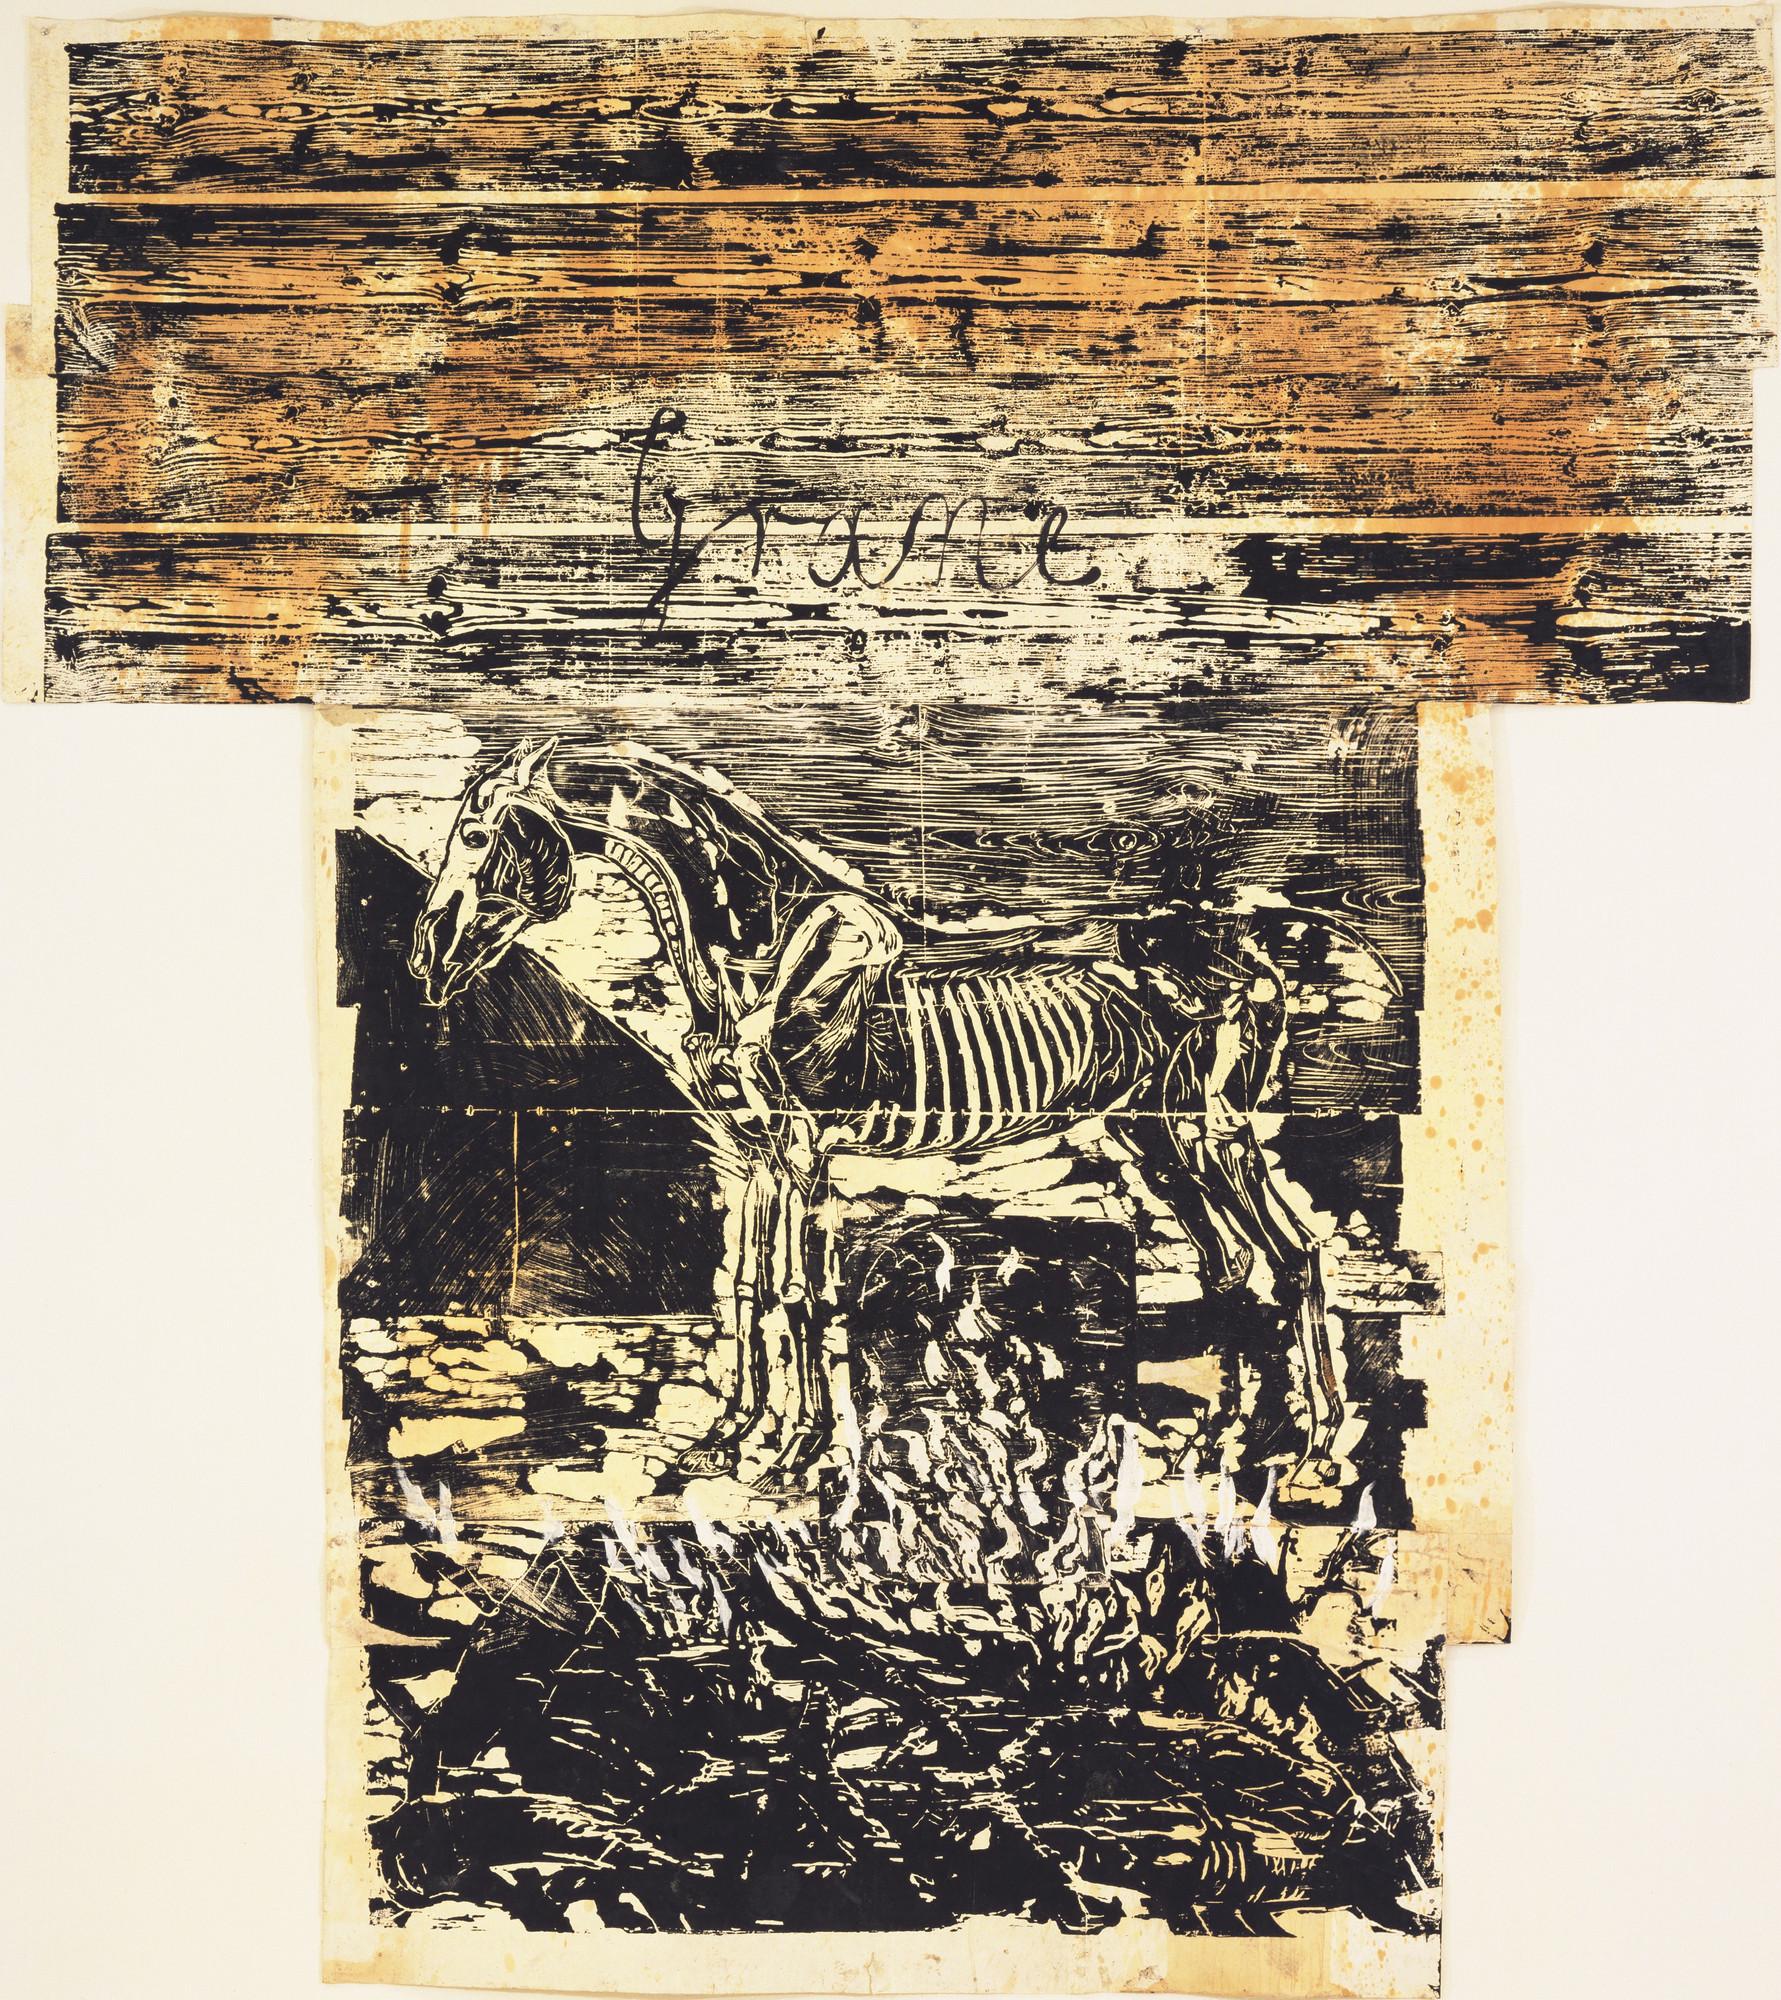 Anselm Kiefer. Grane. (1980-93) | MoMA